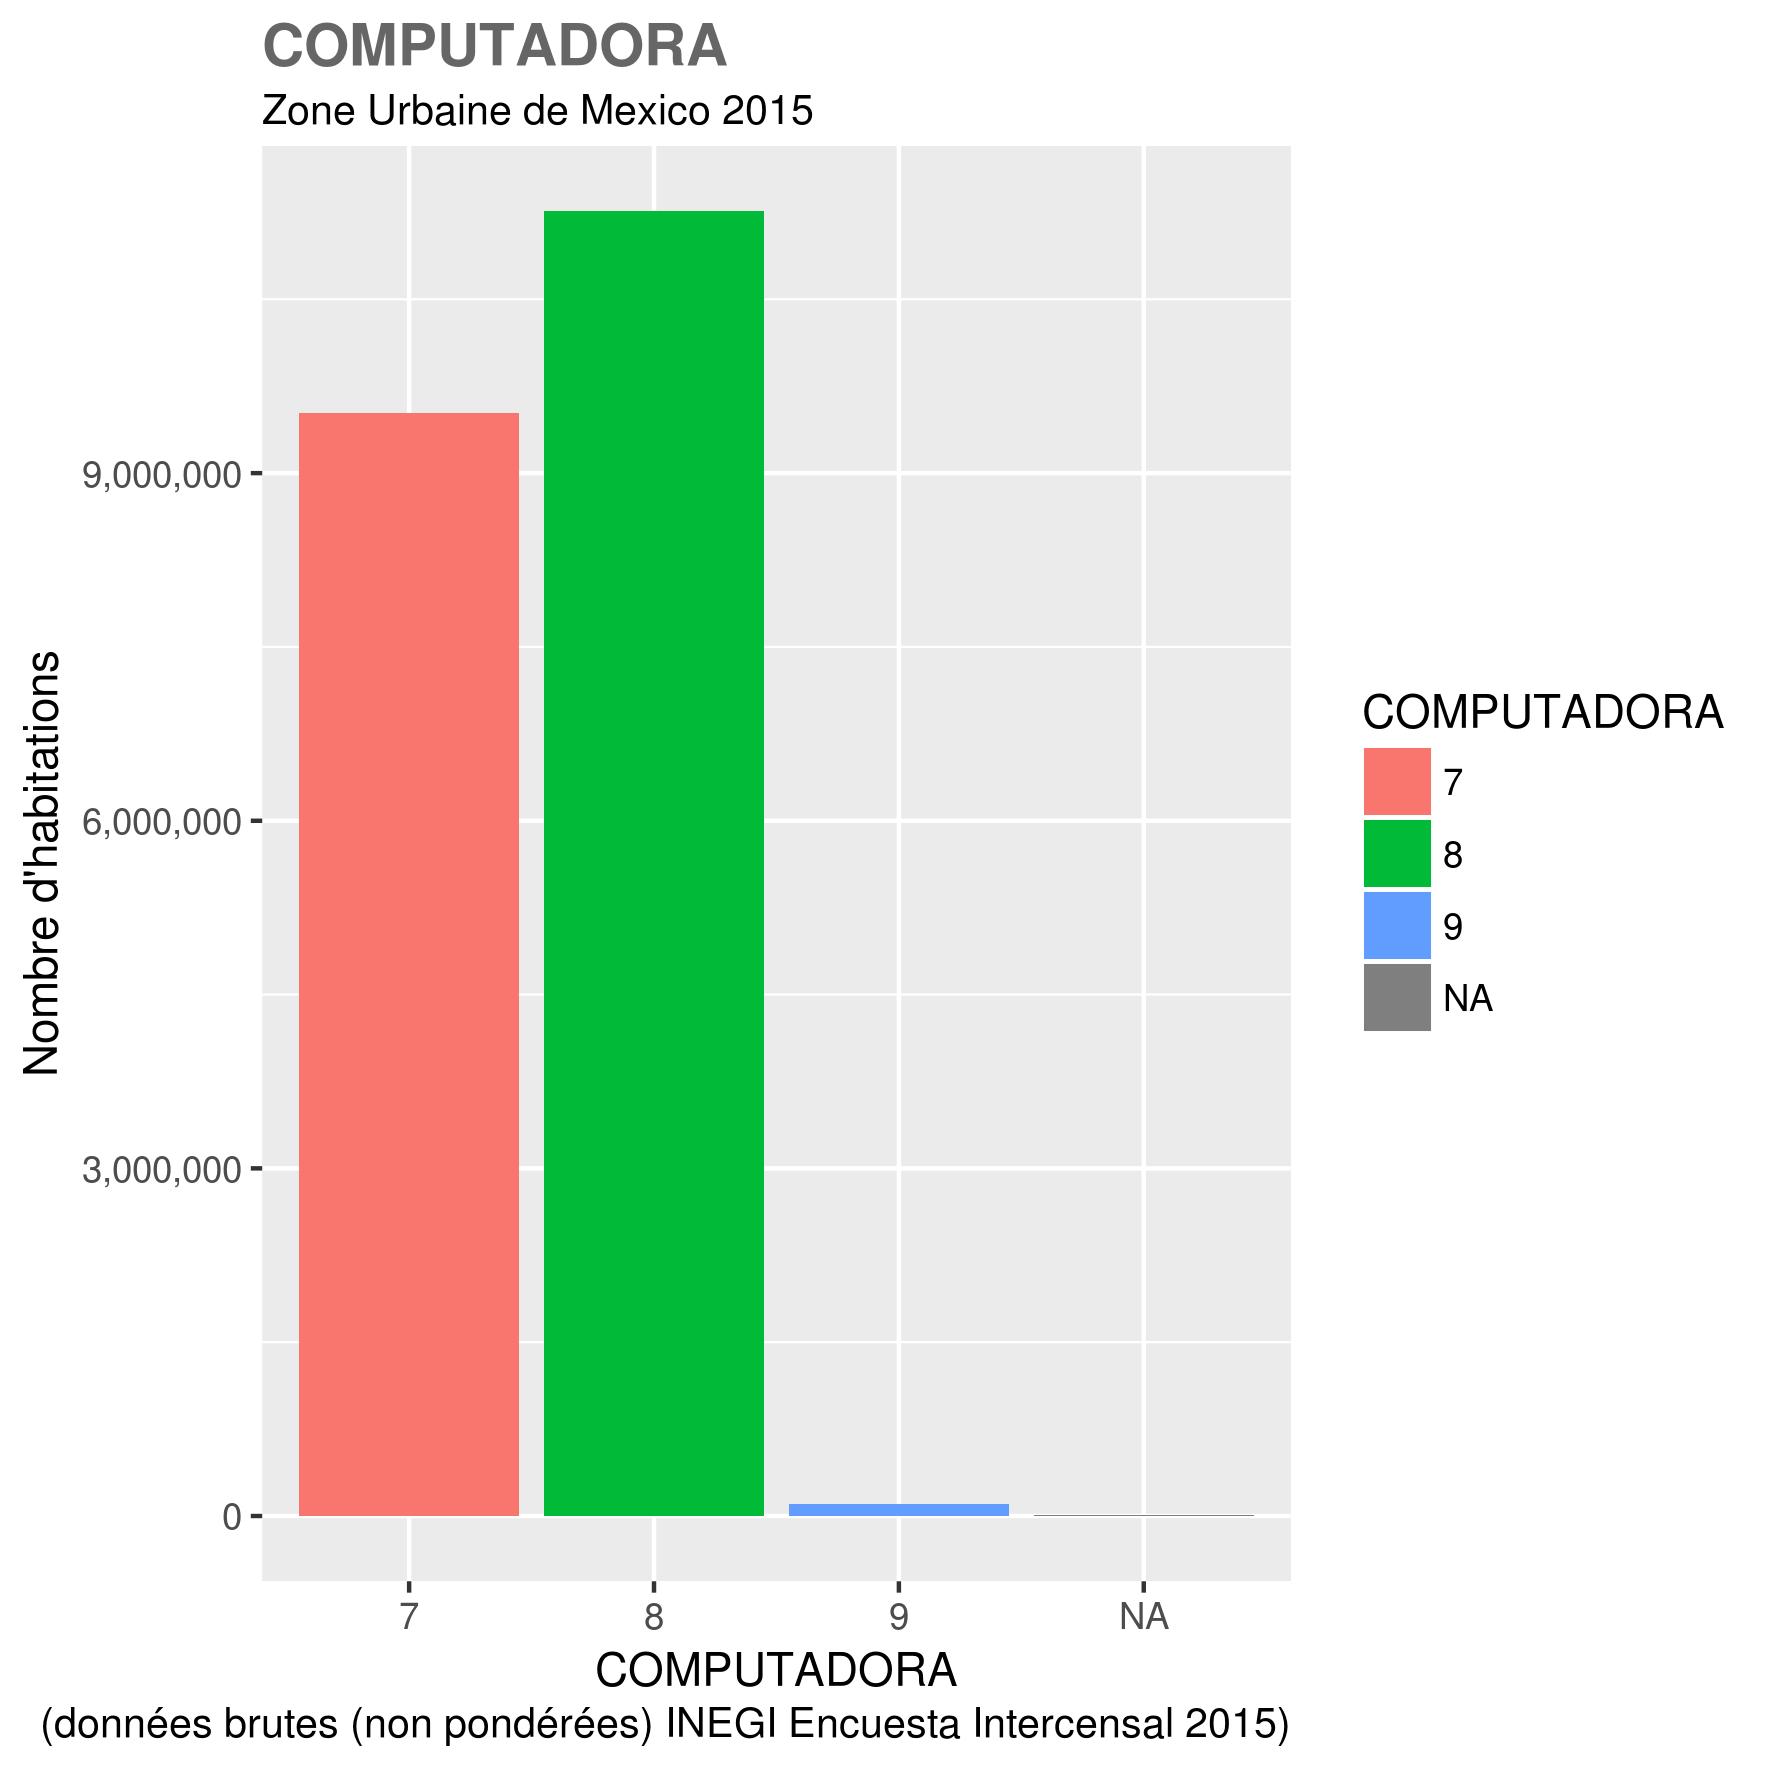 docs/images/ZUM_toutes_variables/2015_ZUM_COMPUTADORA.png